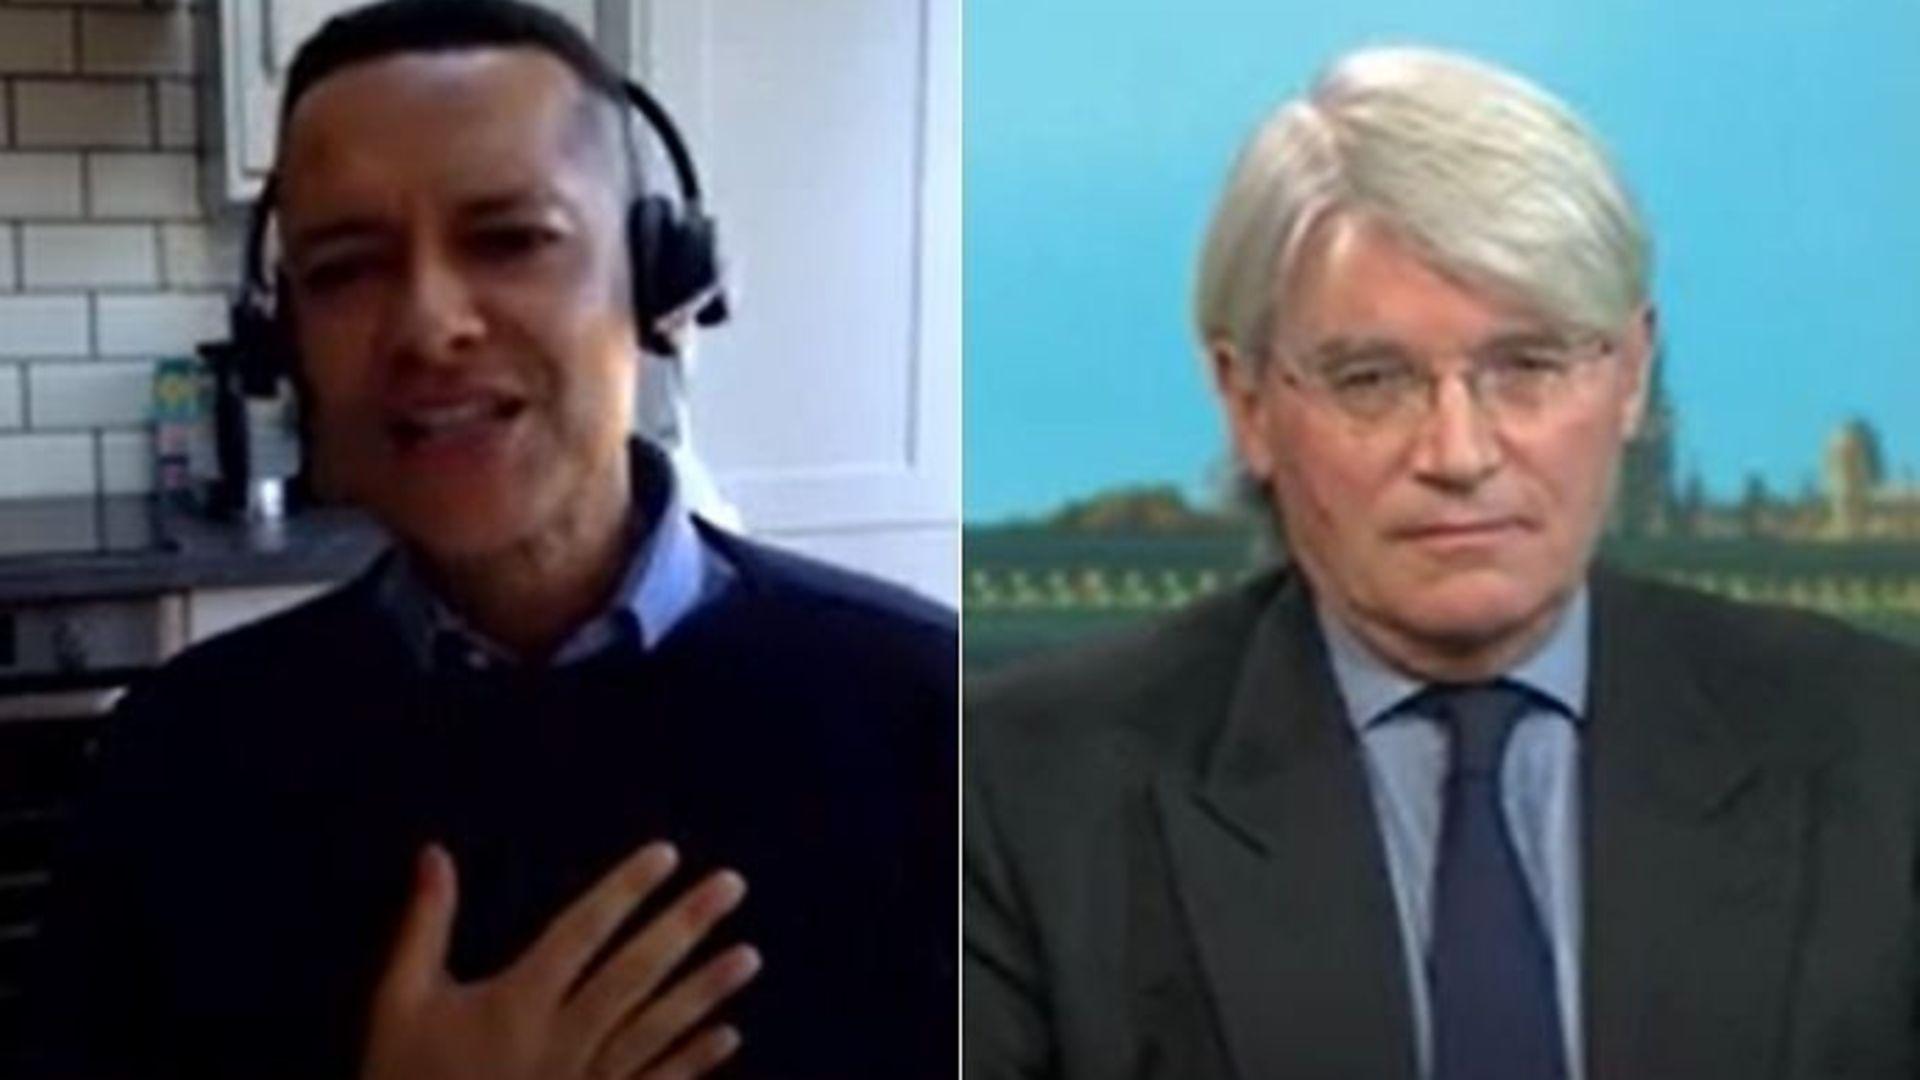 Labour's Clive Lewis (L) and Conservative MP Andrew Mitchell on Politics Live - Credit: BBC, Politics Live